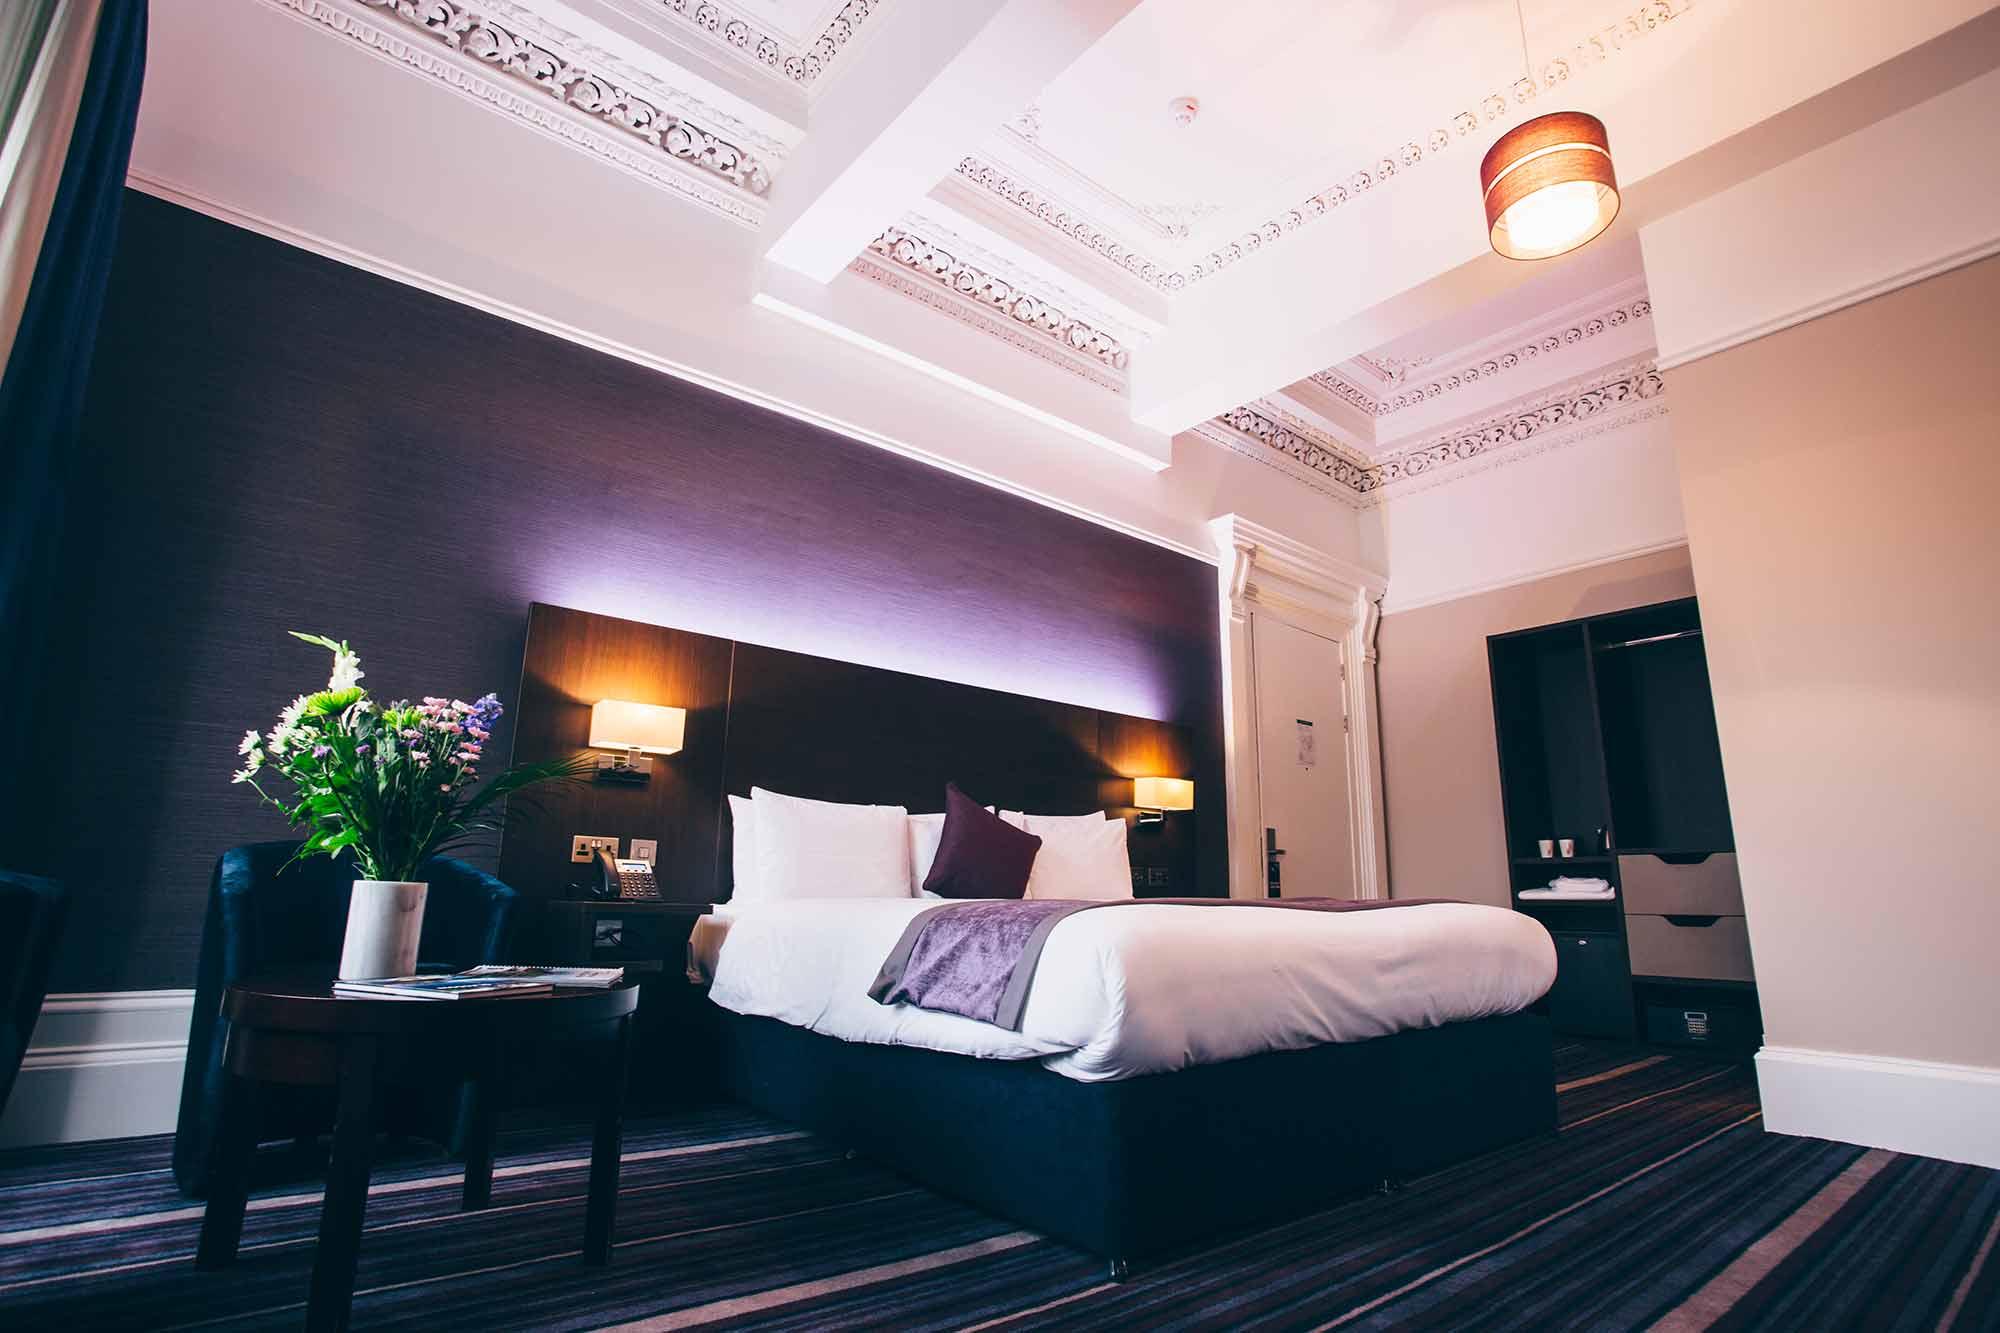 Lorne Hotel Website Design